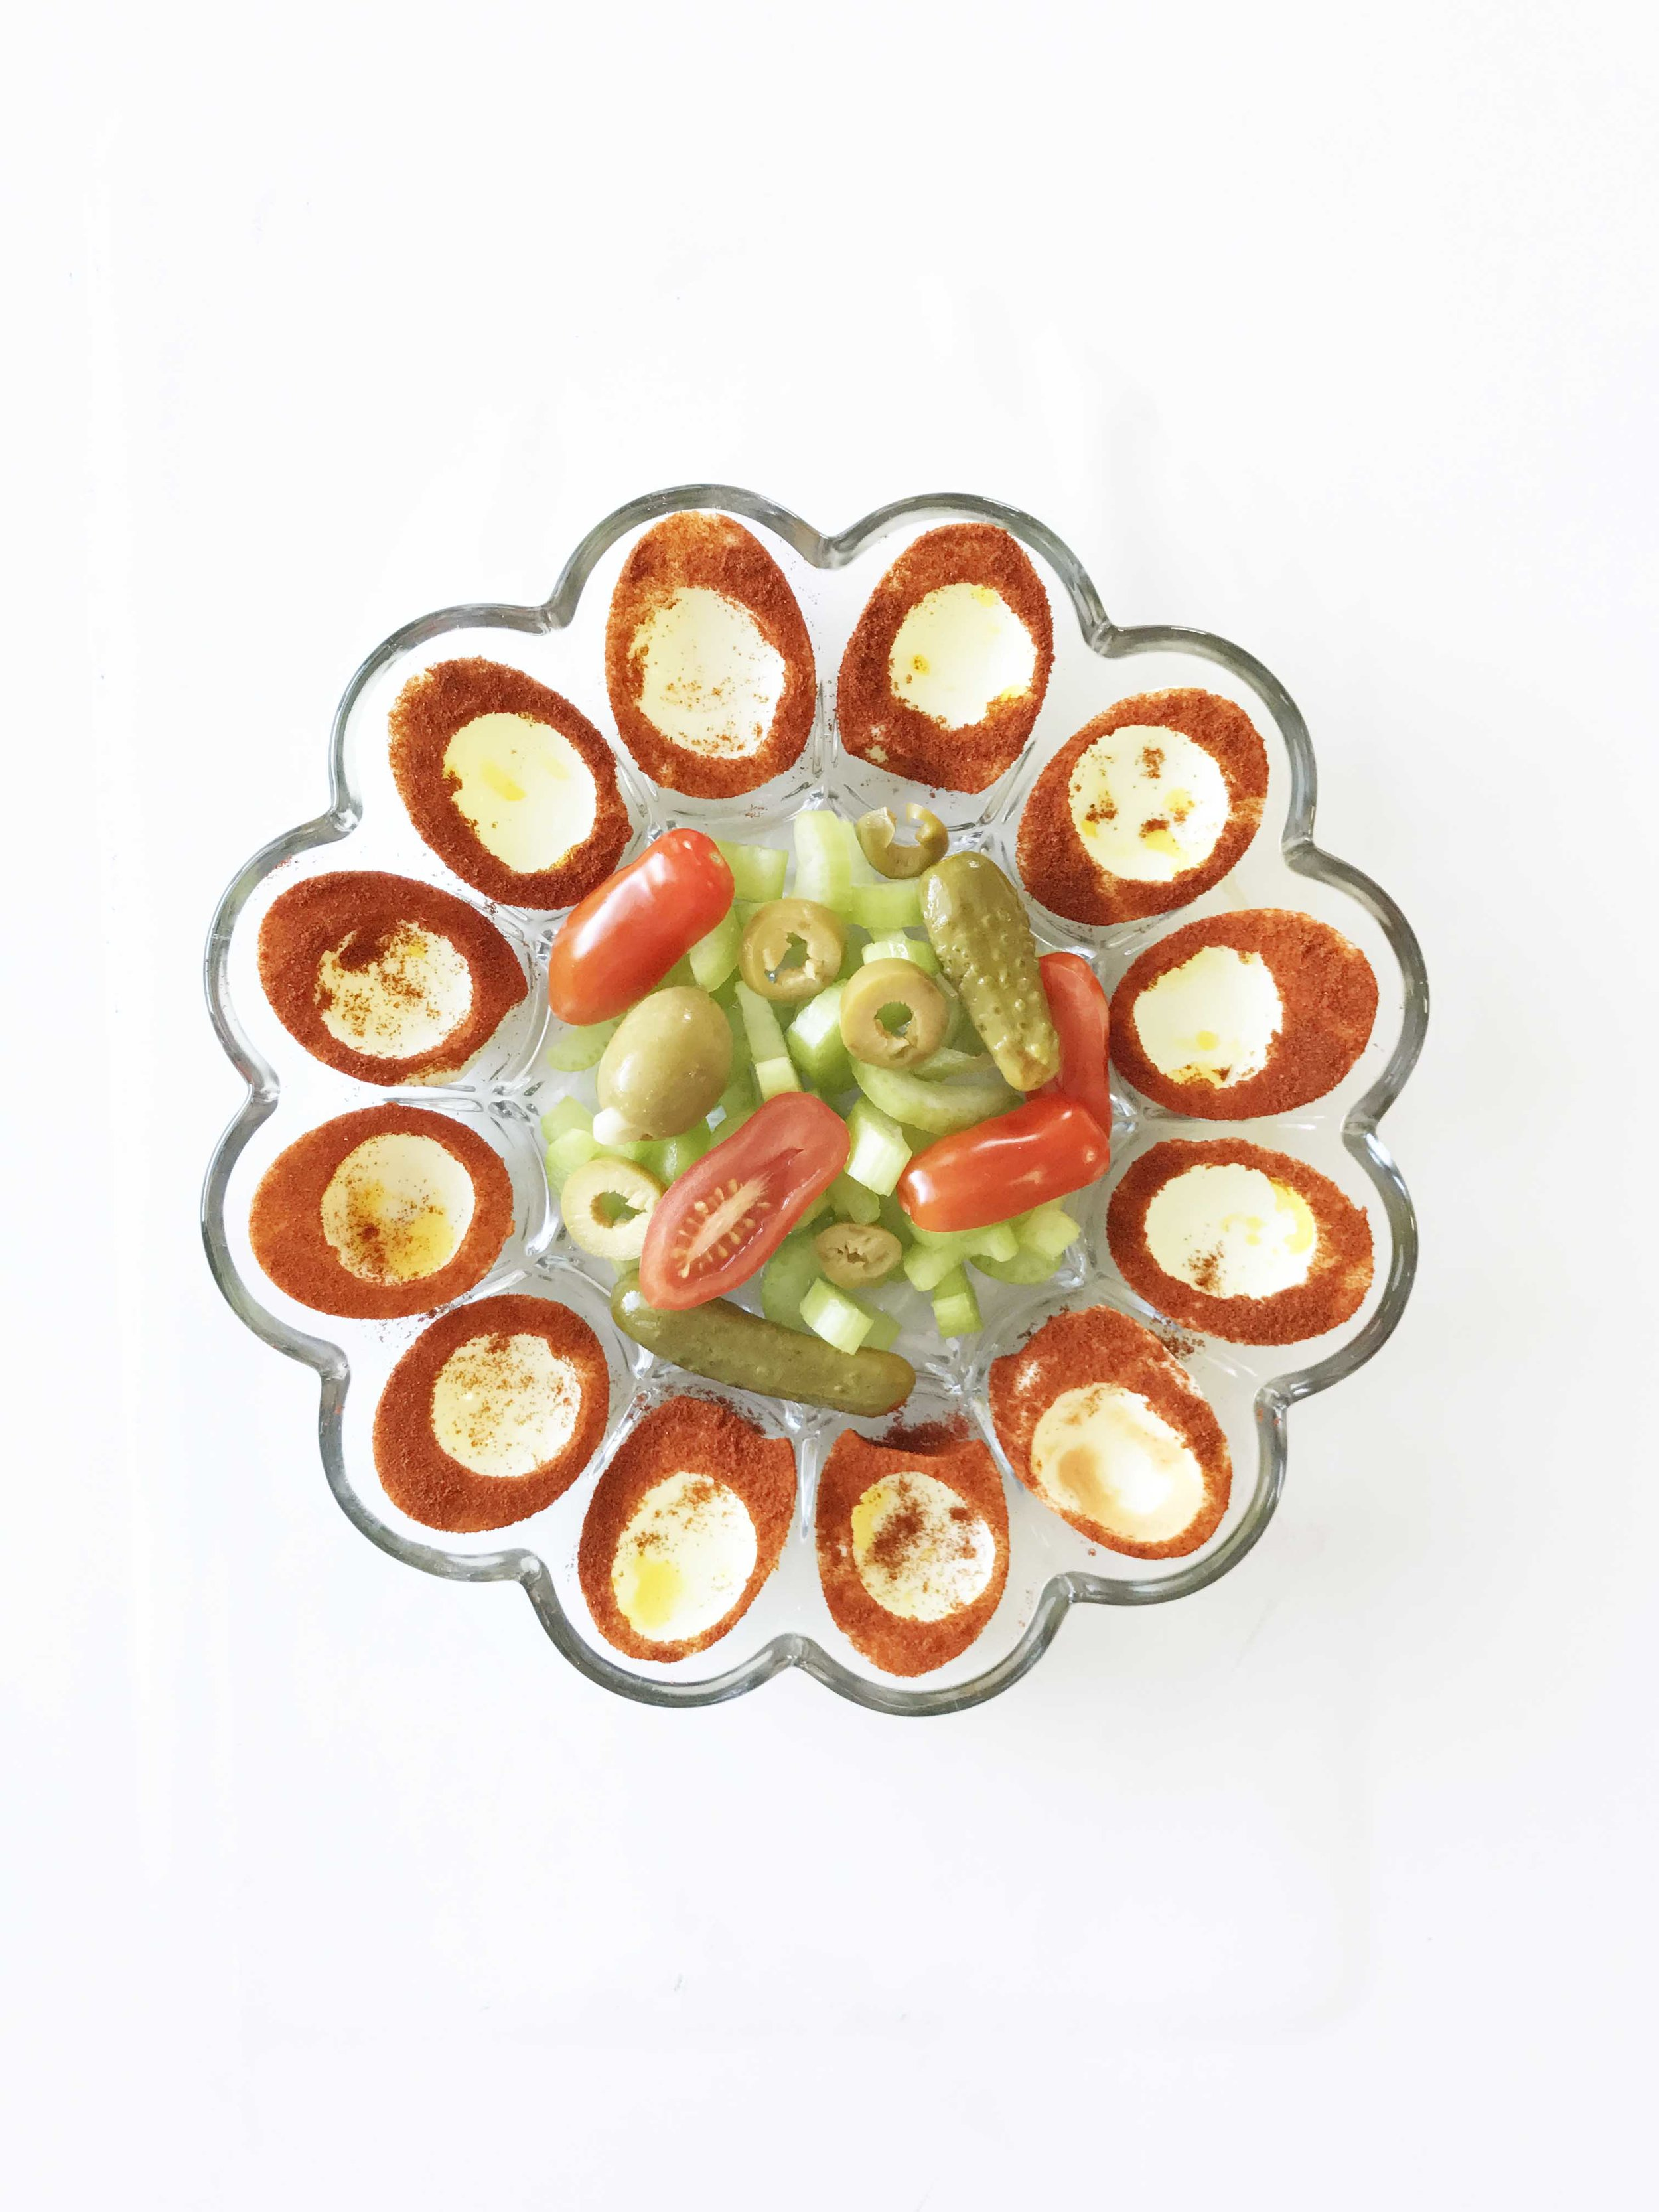 bloody-mary-deviled-eggs4.jpg